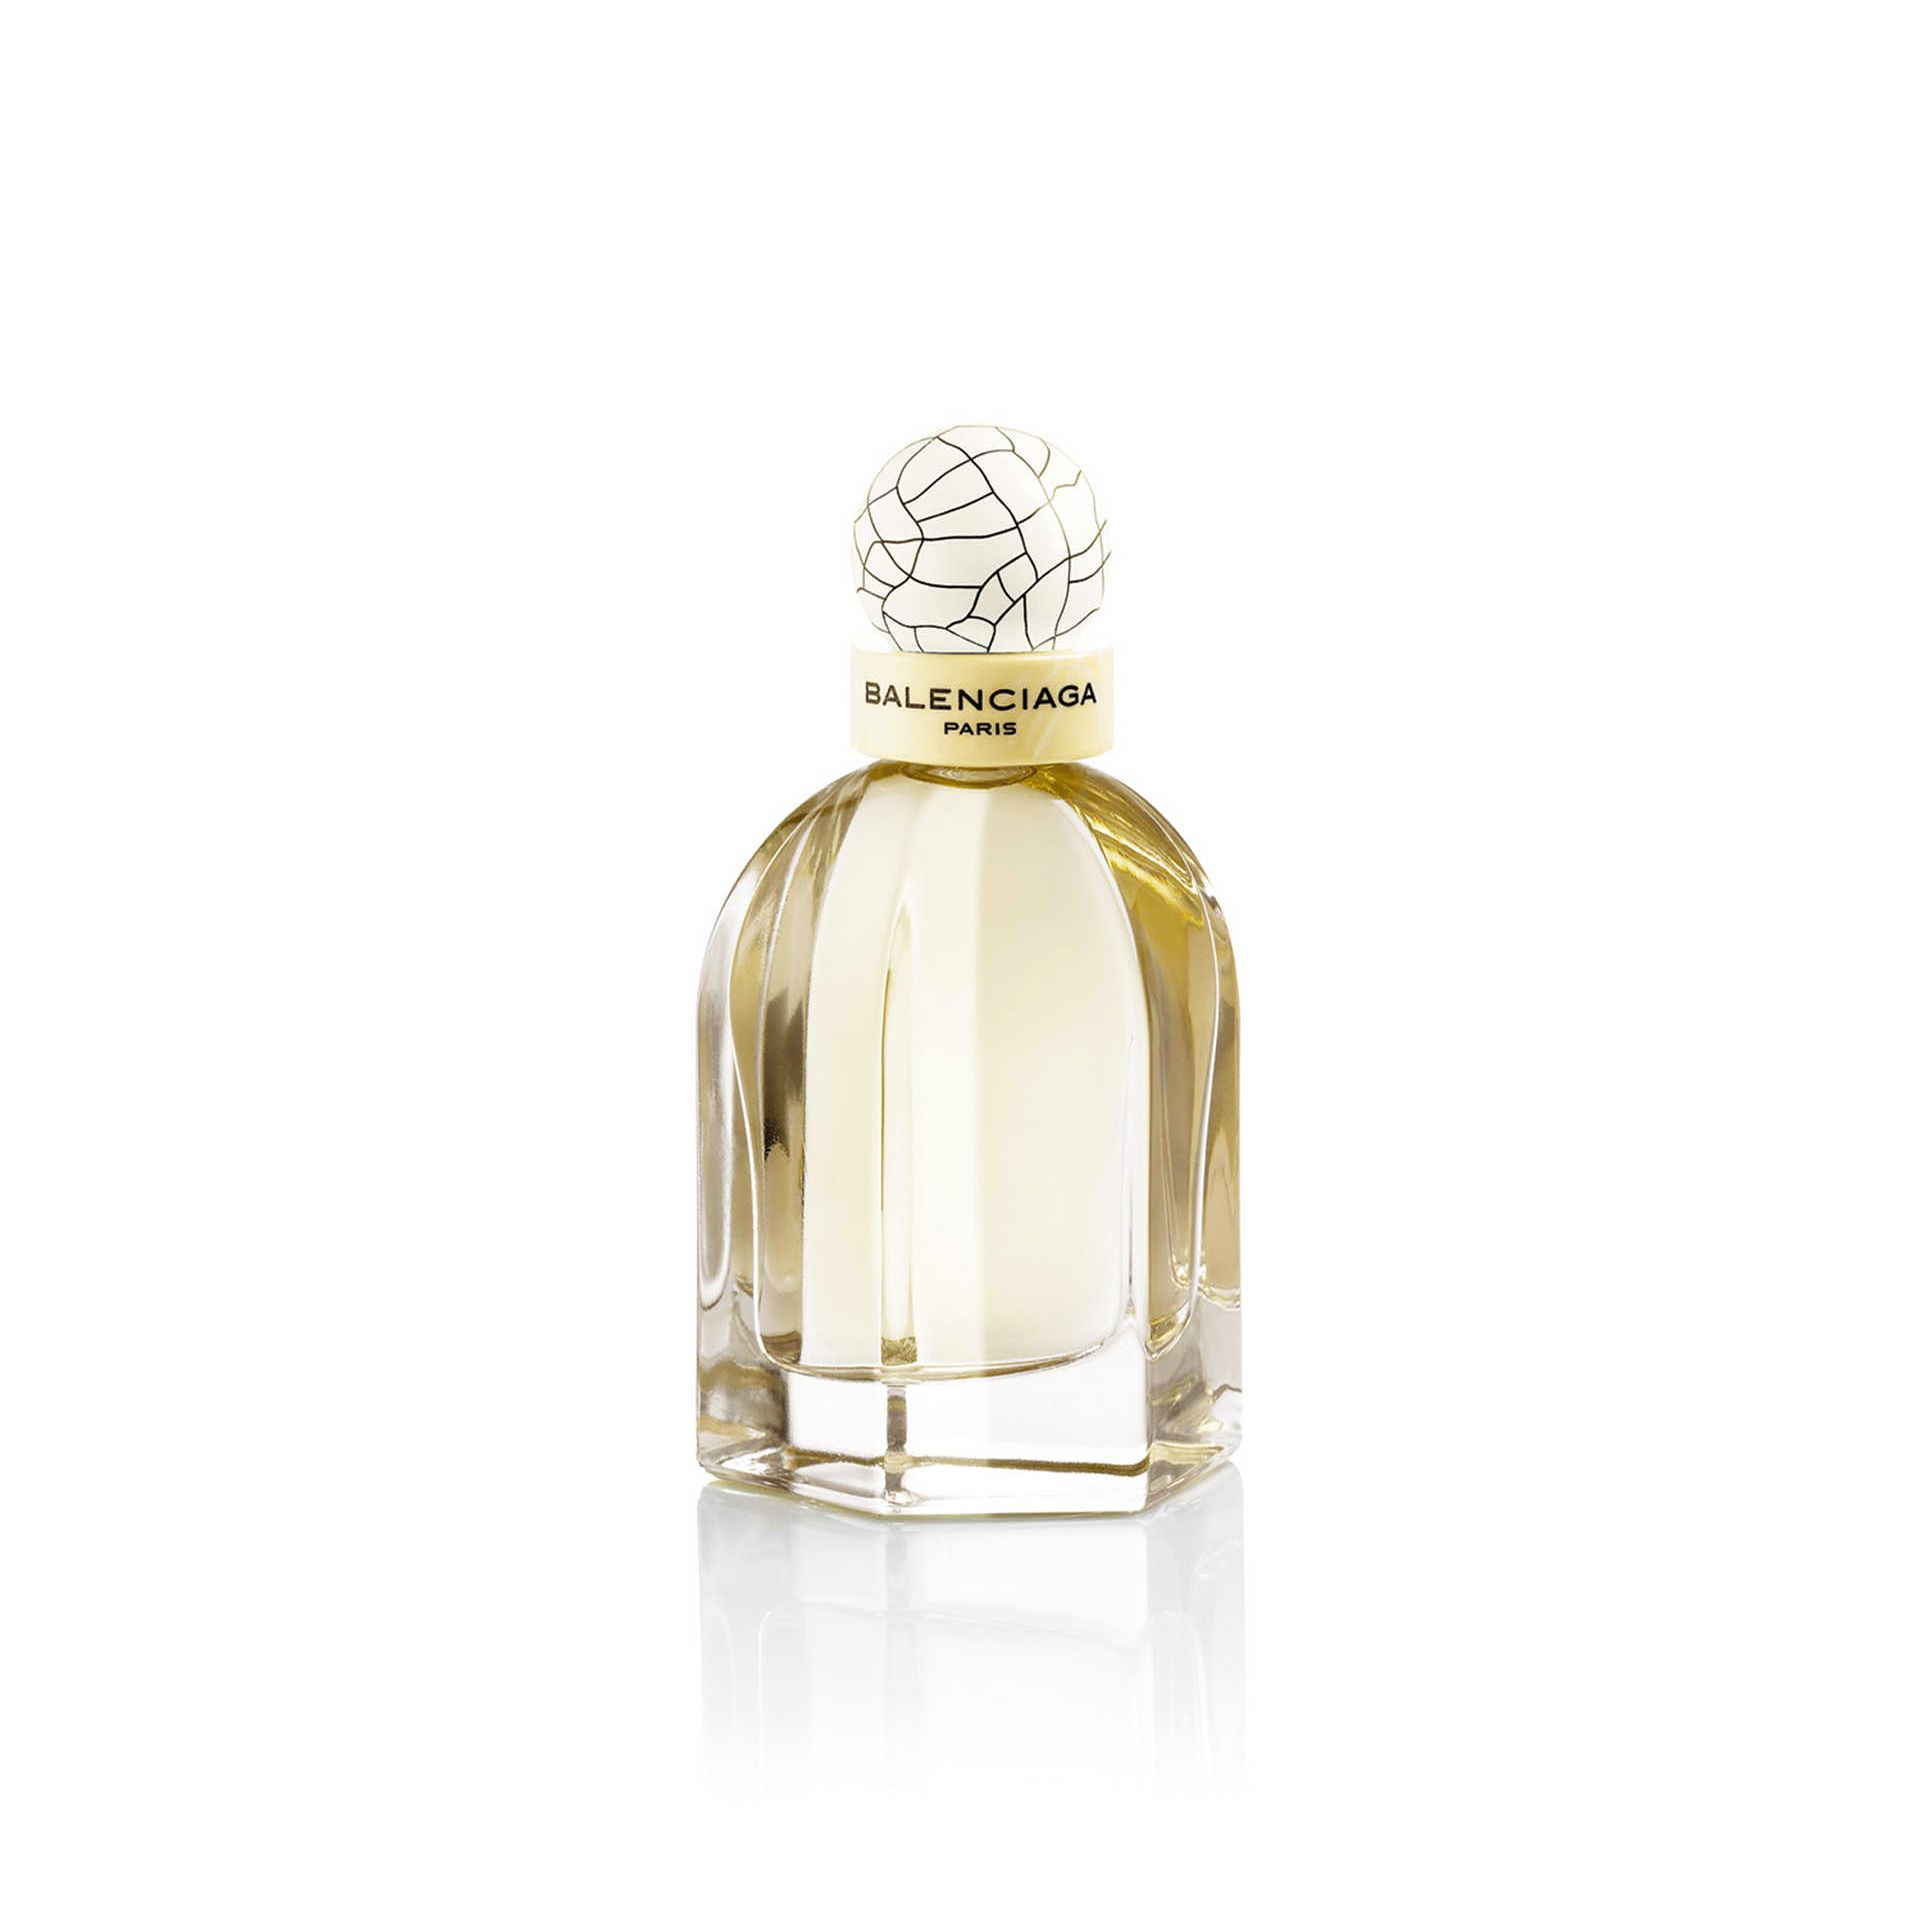 BALENCIAGA Balenciaga Paris Eau De Parfum 50 Ml Balenciaga Paris Parfüm D f